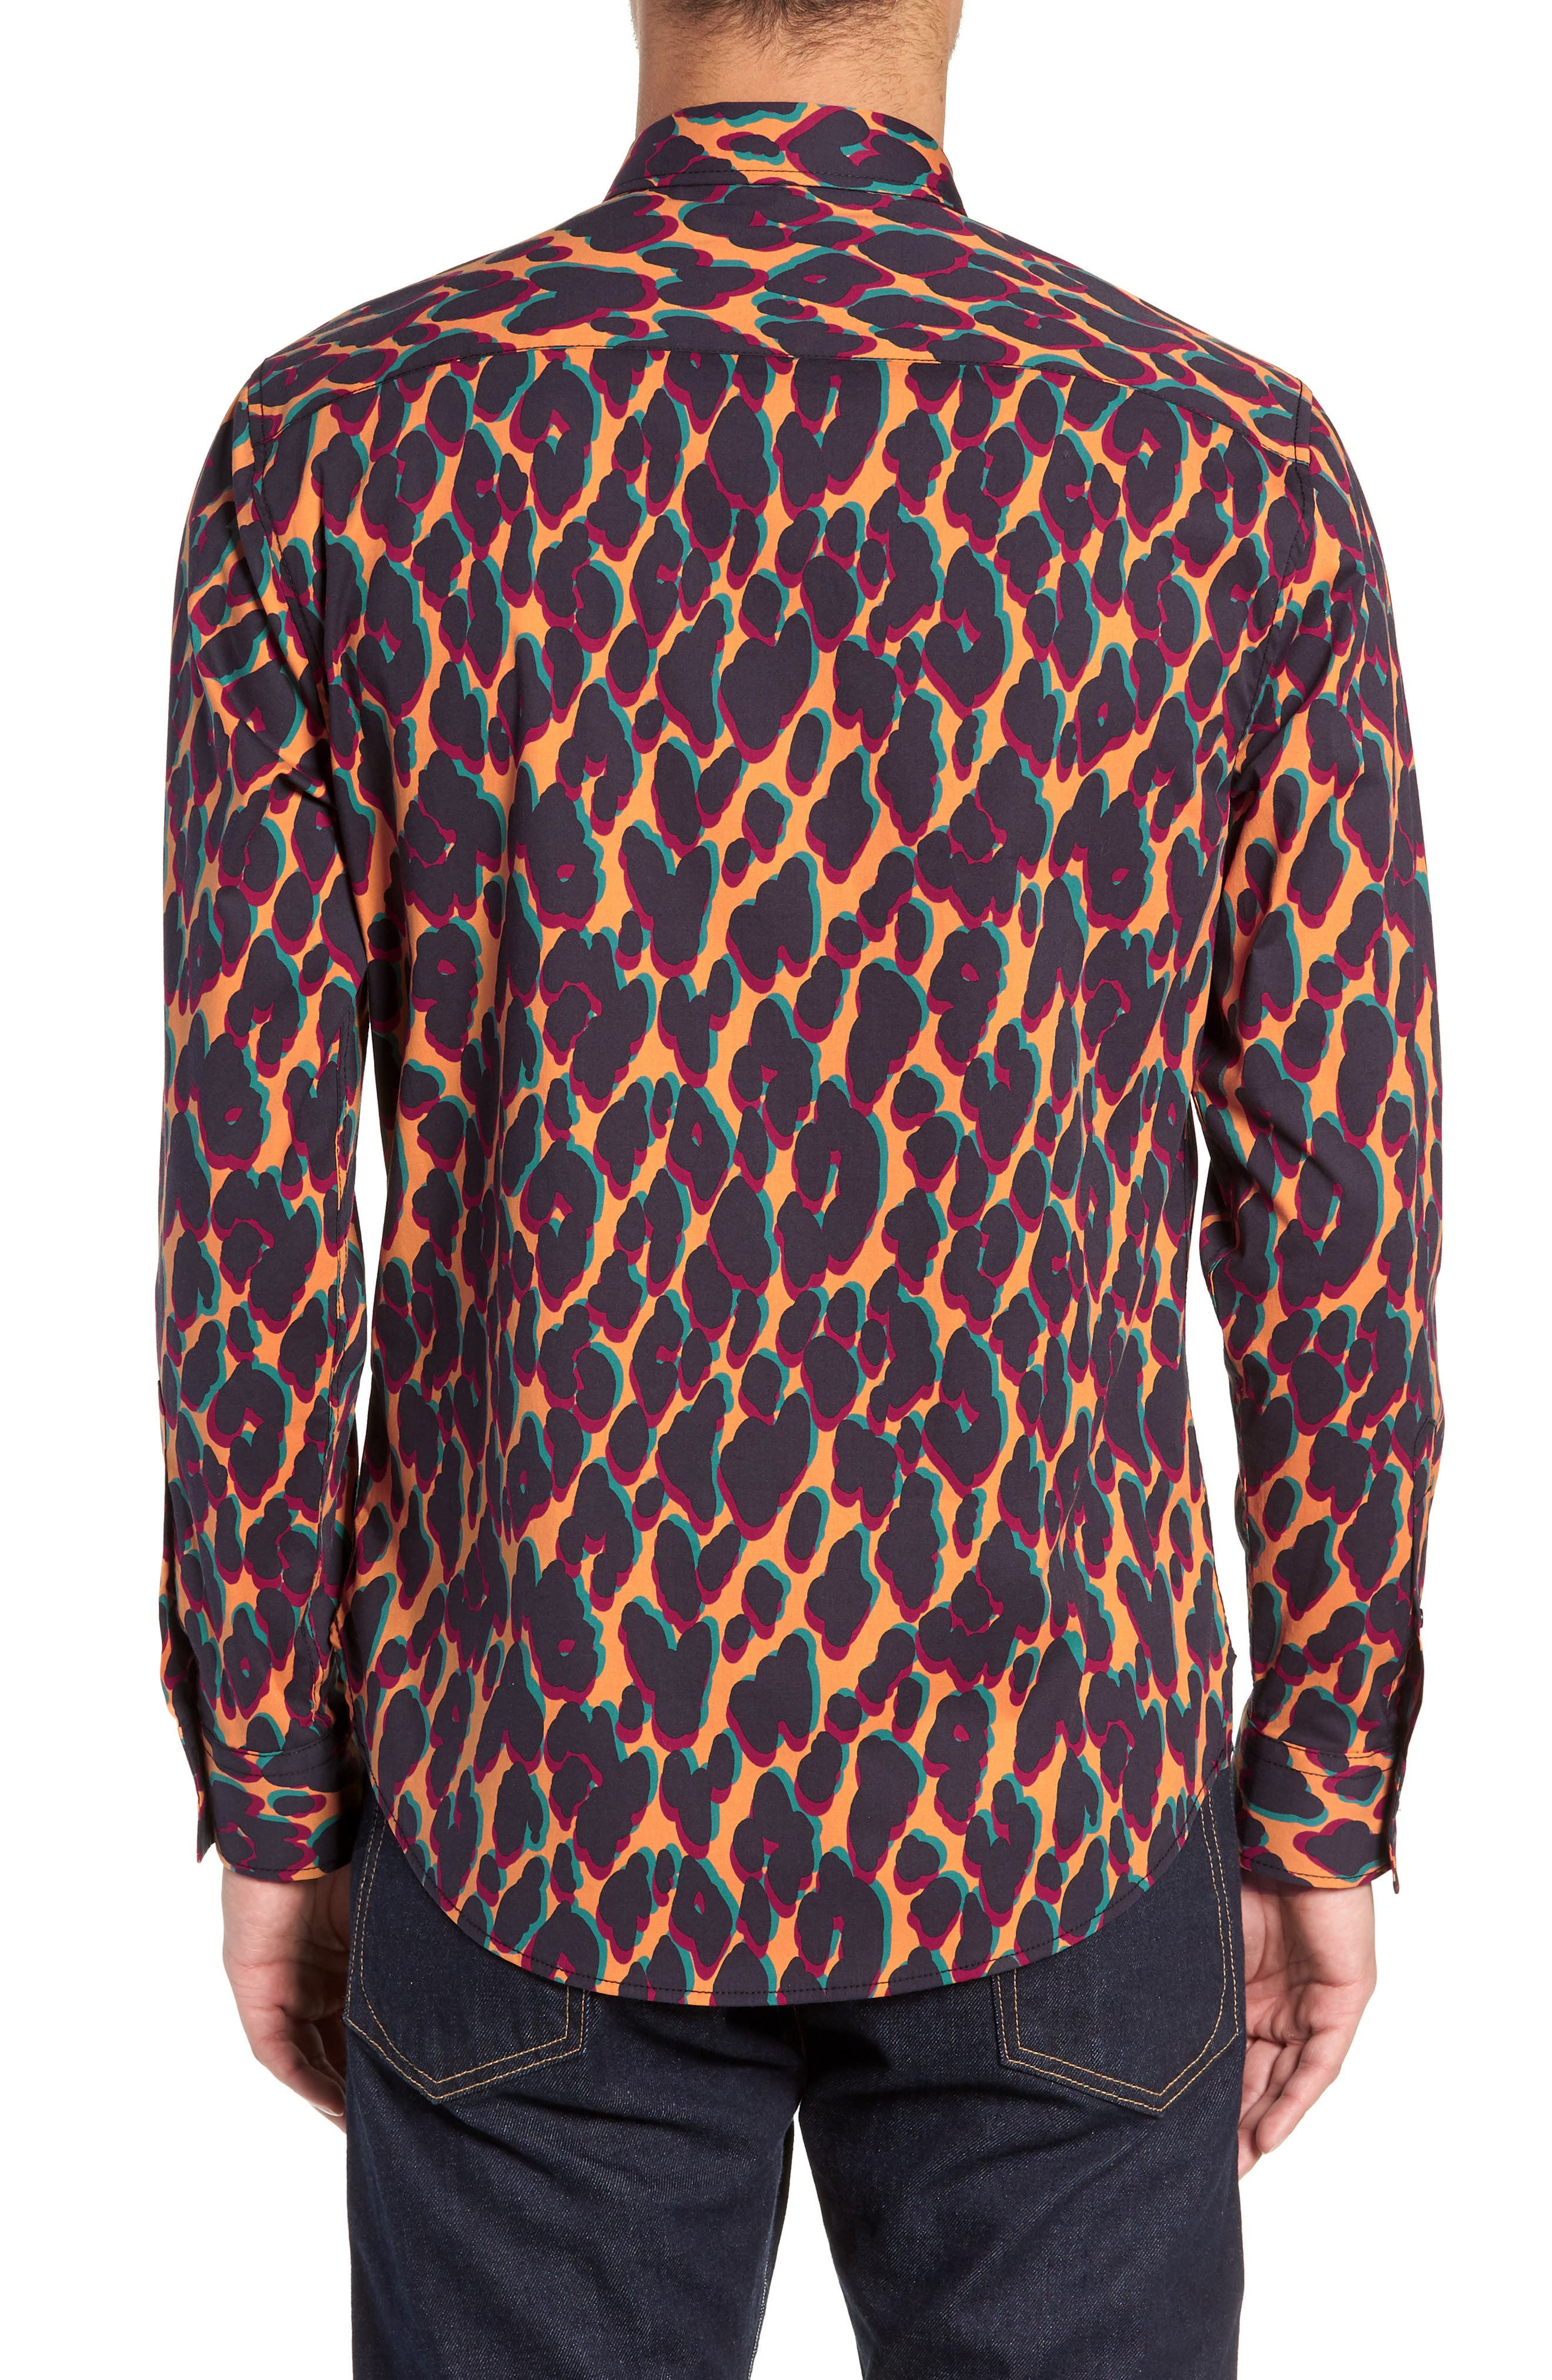 Leopard Print Sport Shirt,                             Alternate thumbnail 2, color,                             ORANGE LEOPARD OFFSET